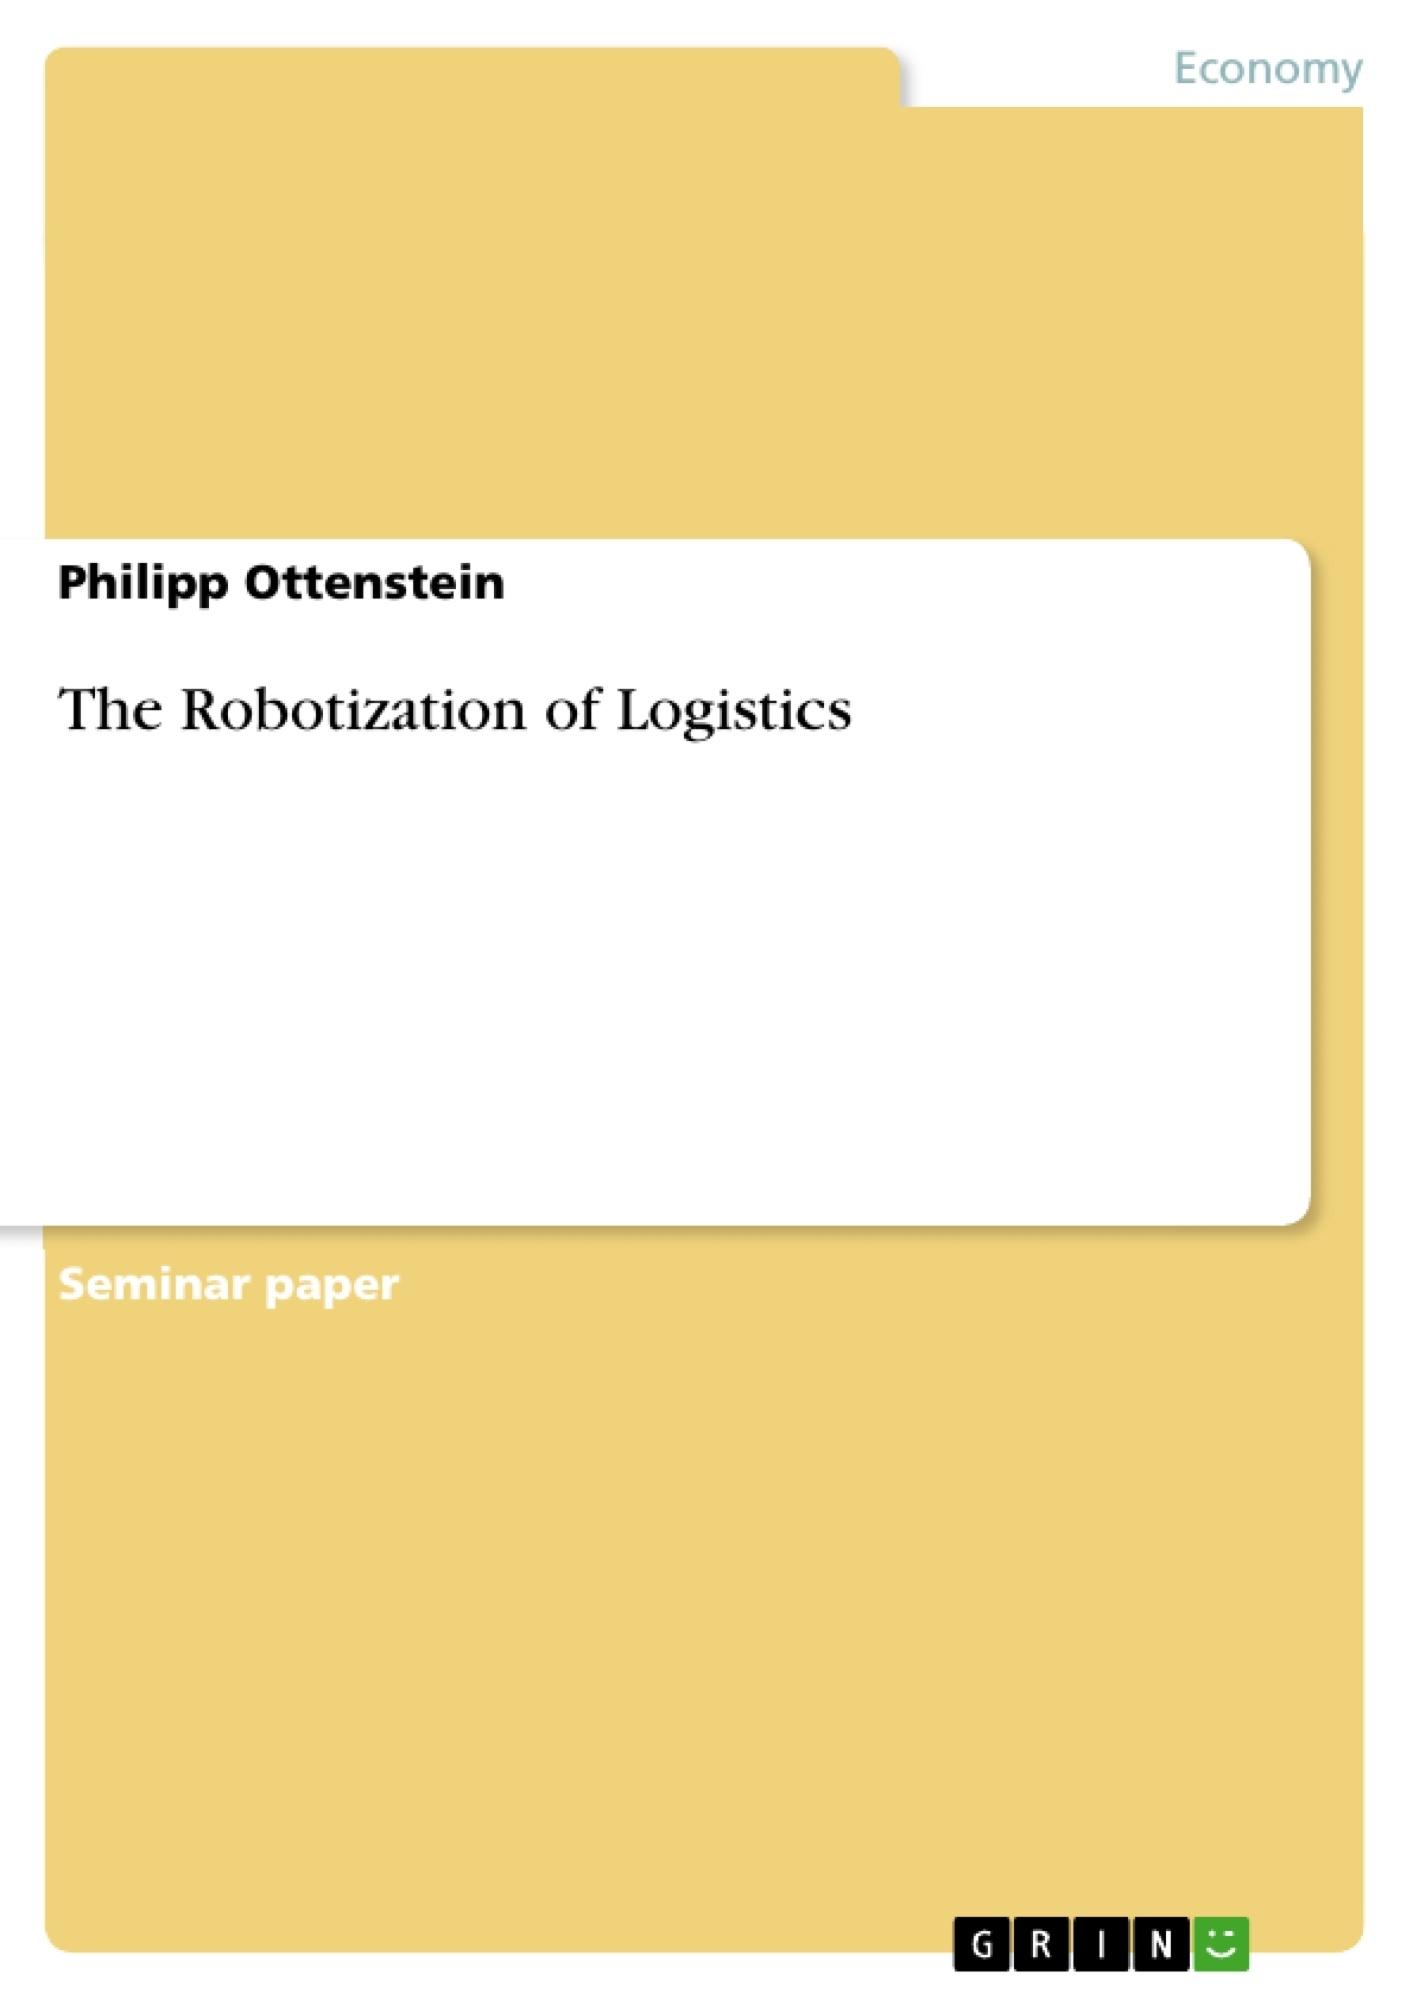 Title: The Robotization of Logistics